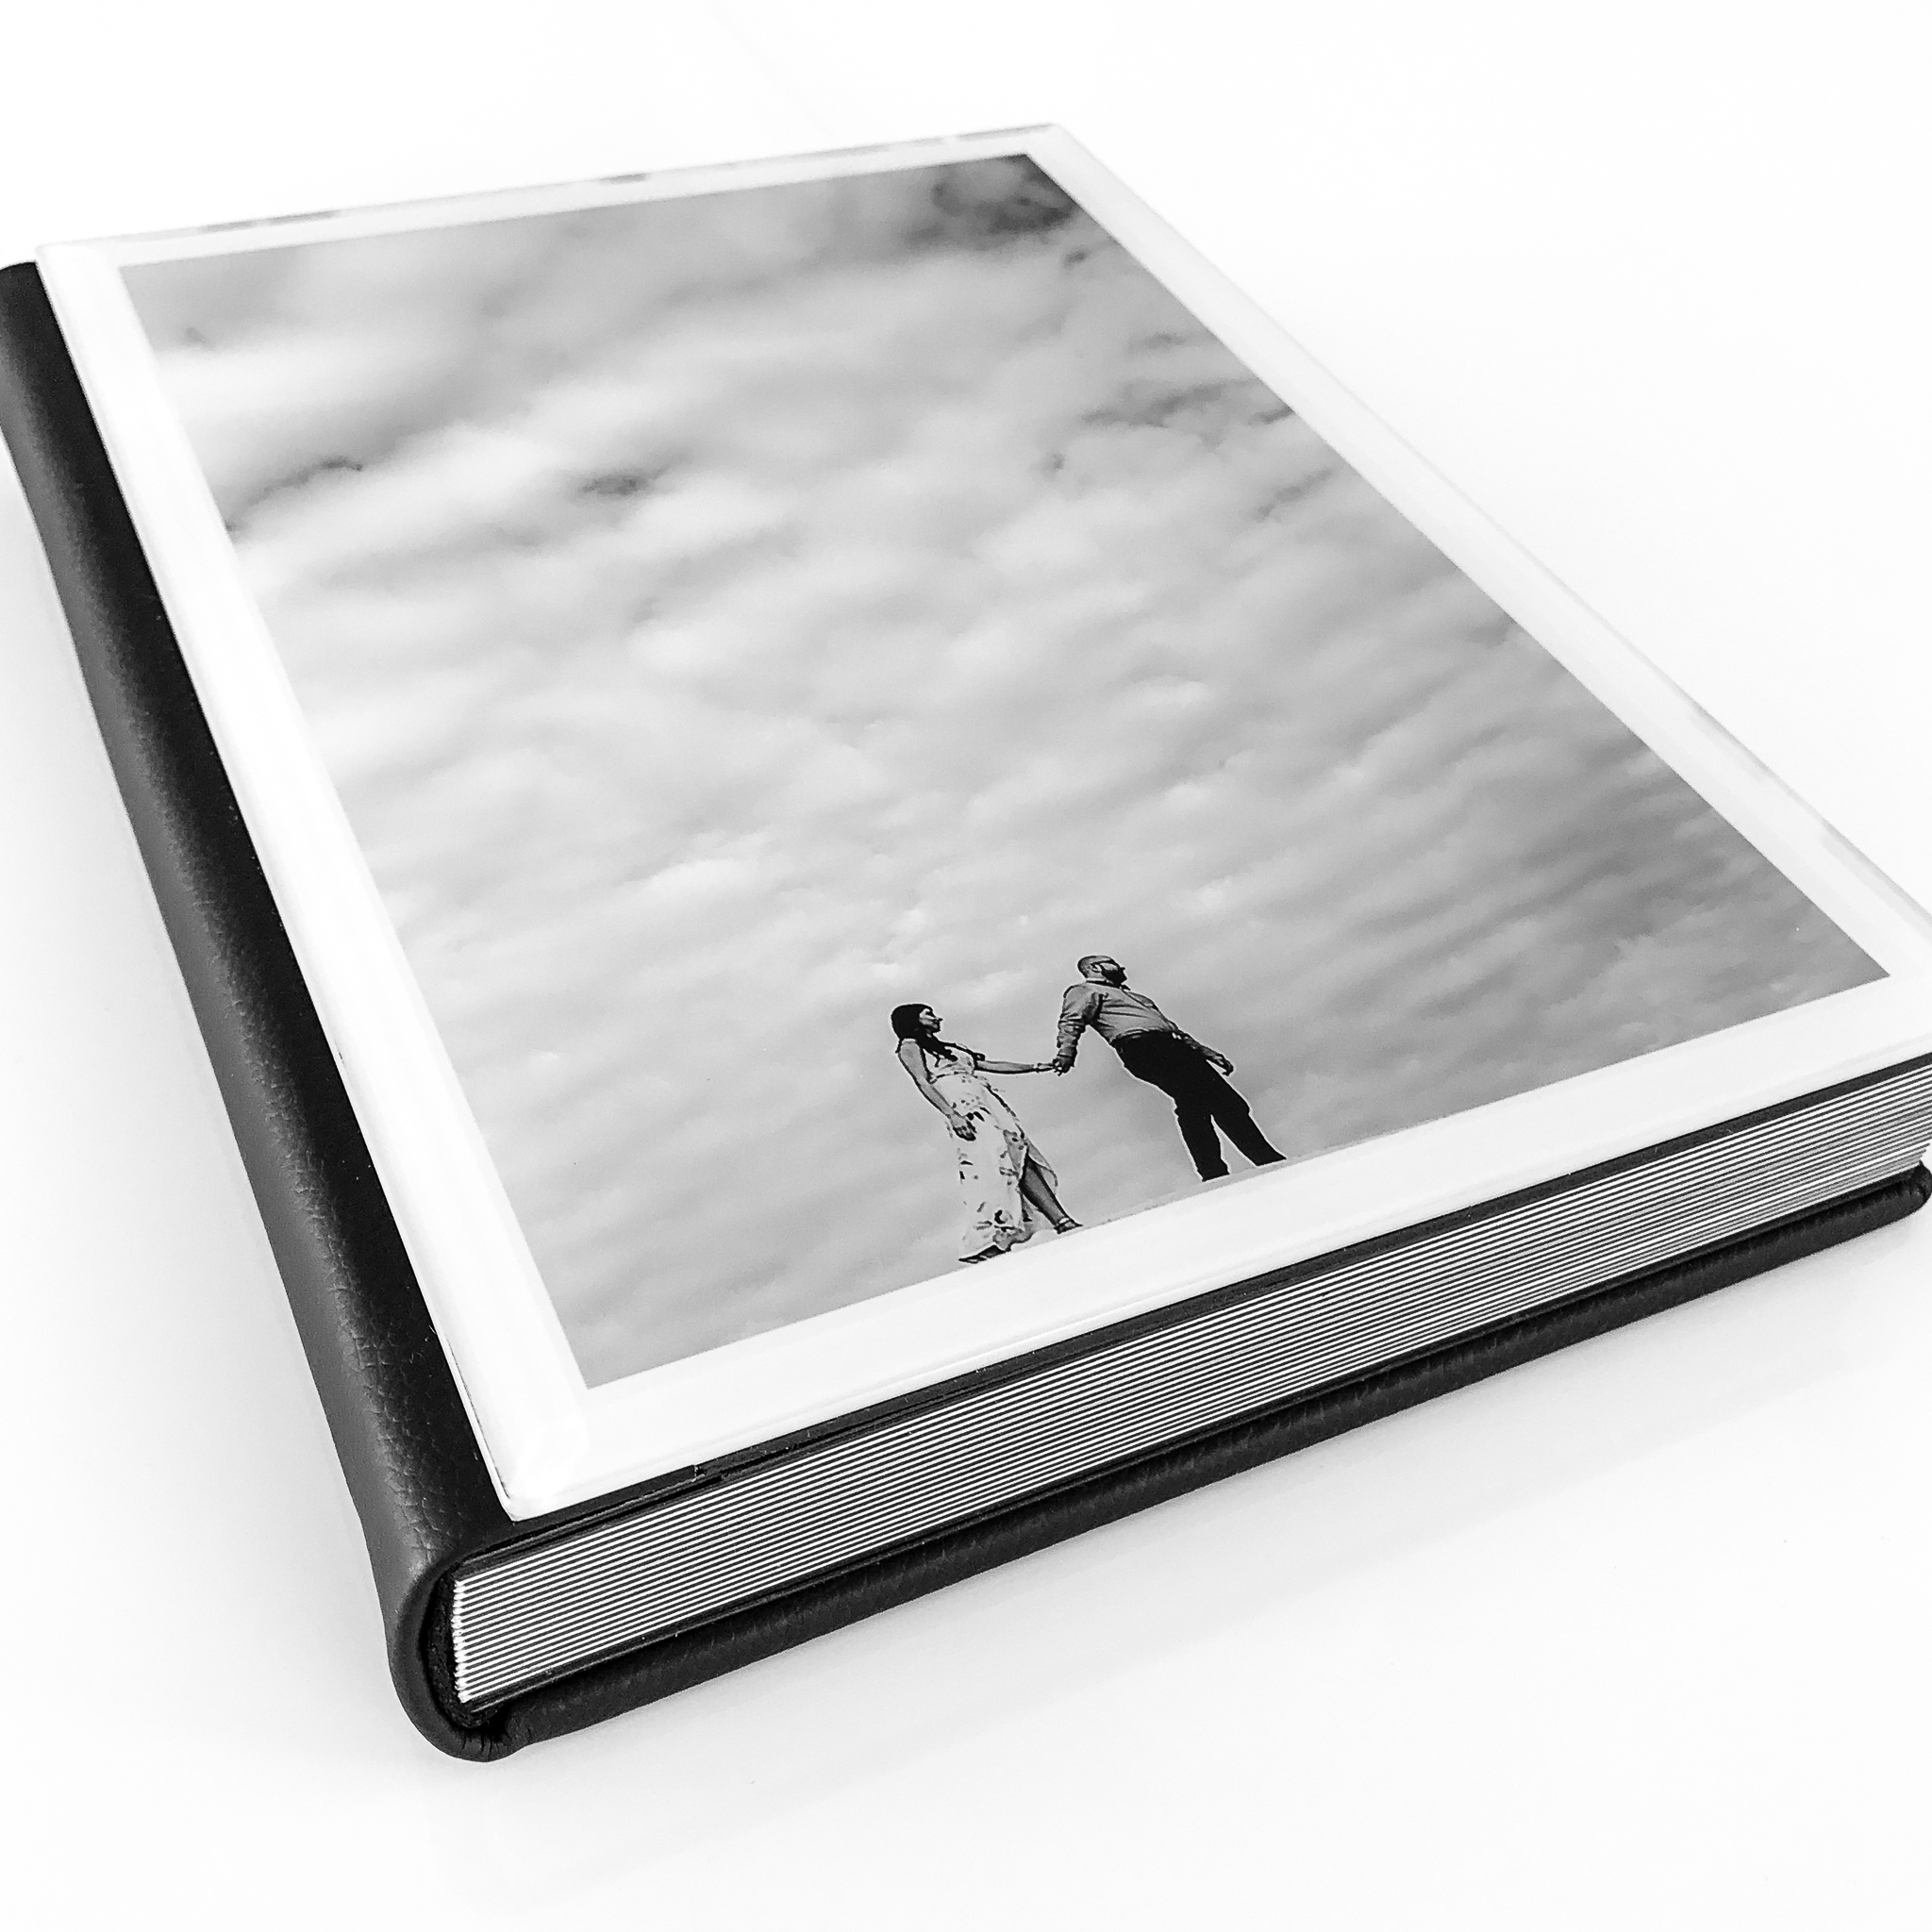 002-wedding-book-steph.jpg